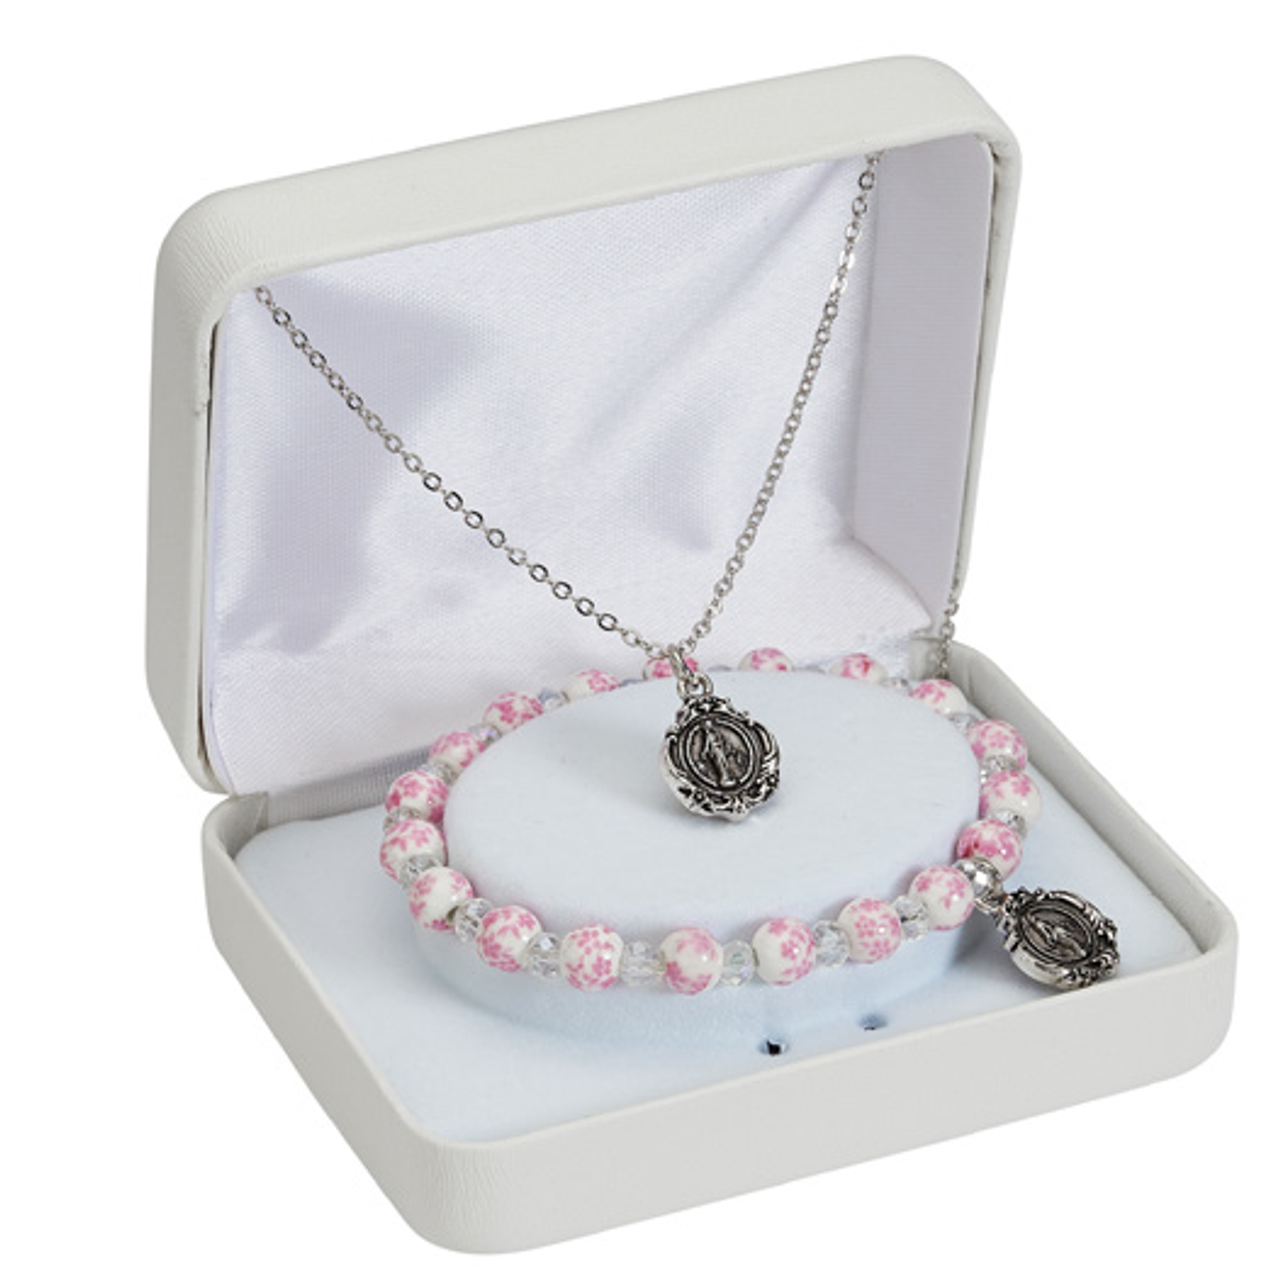 Miraculous Medal Set Necklace Bracelet Pink Ceramic Beads